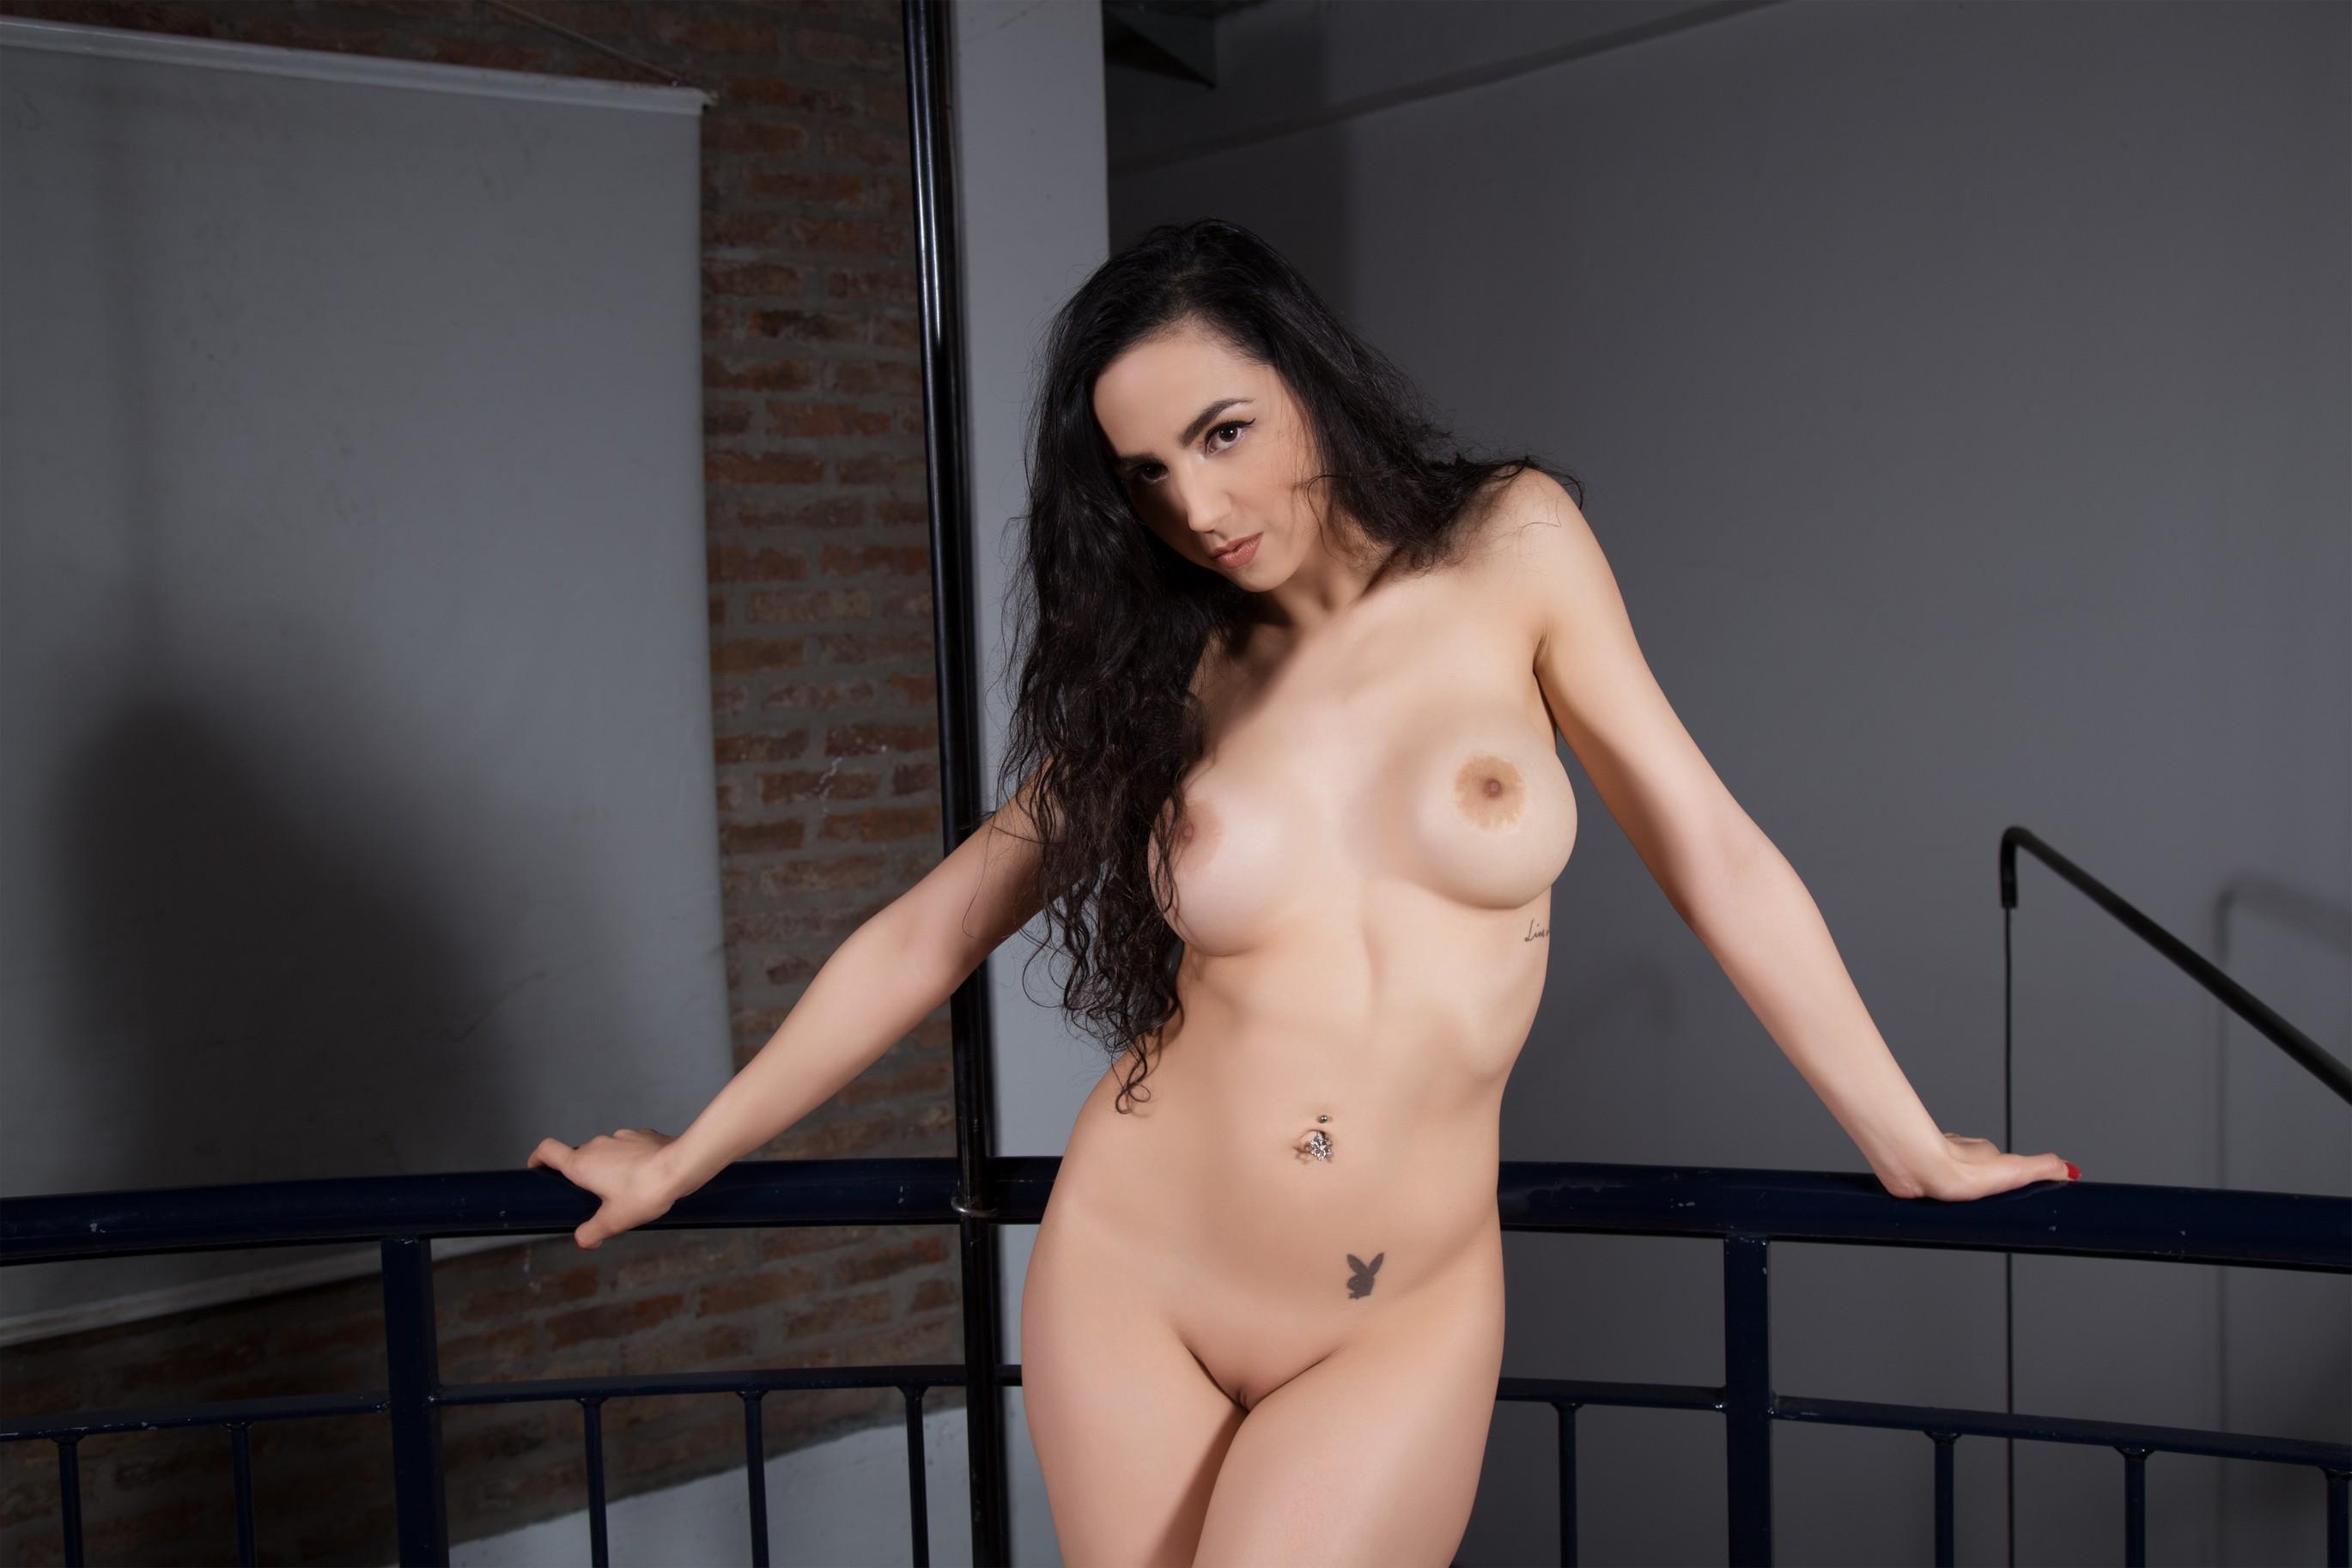 Flavia Playboy wallpaper flavia de celis, brunette, sexy girl, adult model